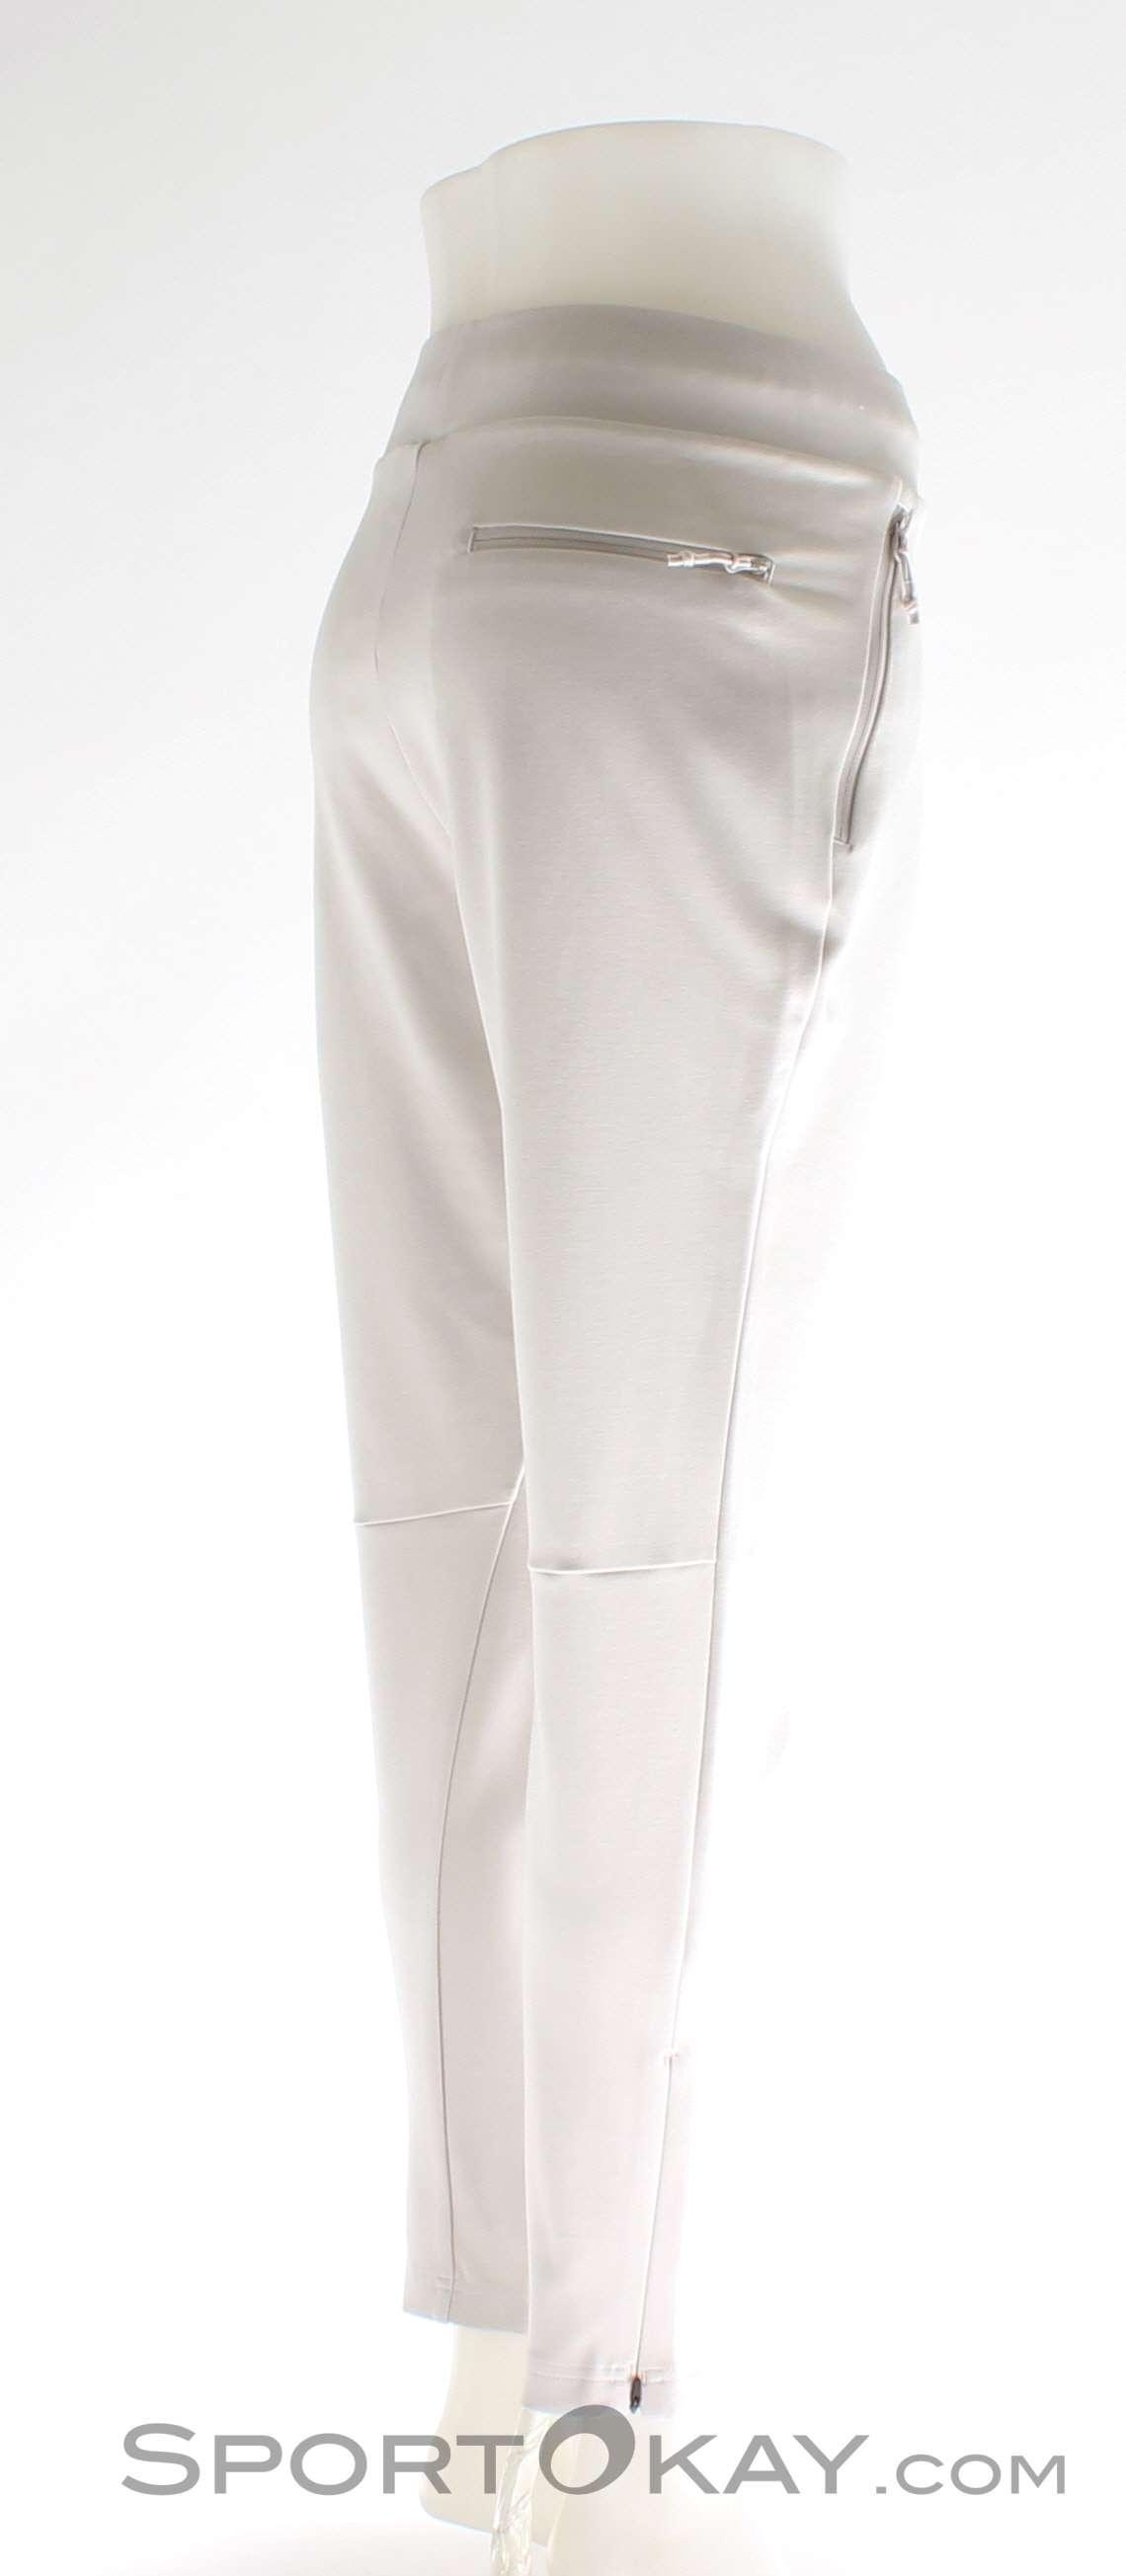 6c6c96f1af3d adidas ZNE Strike Womens Training Pants - Pants - Fitness Clothing ...